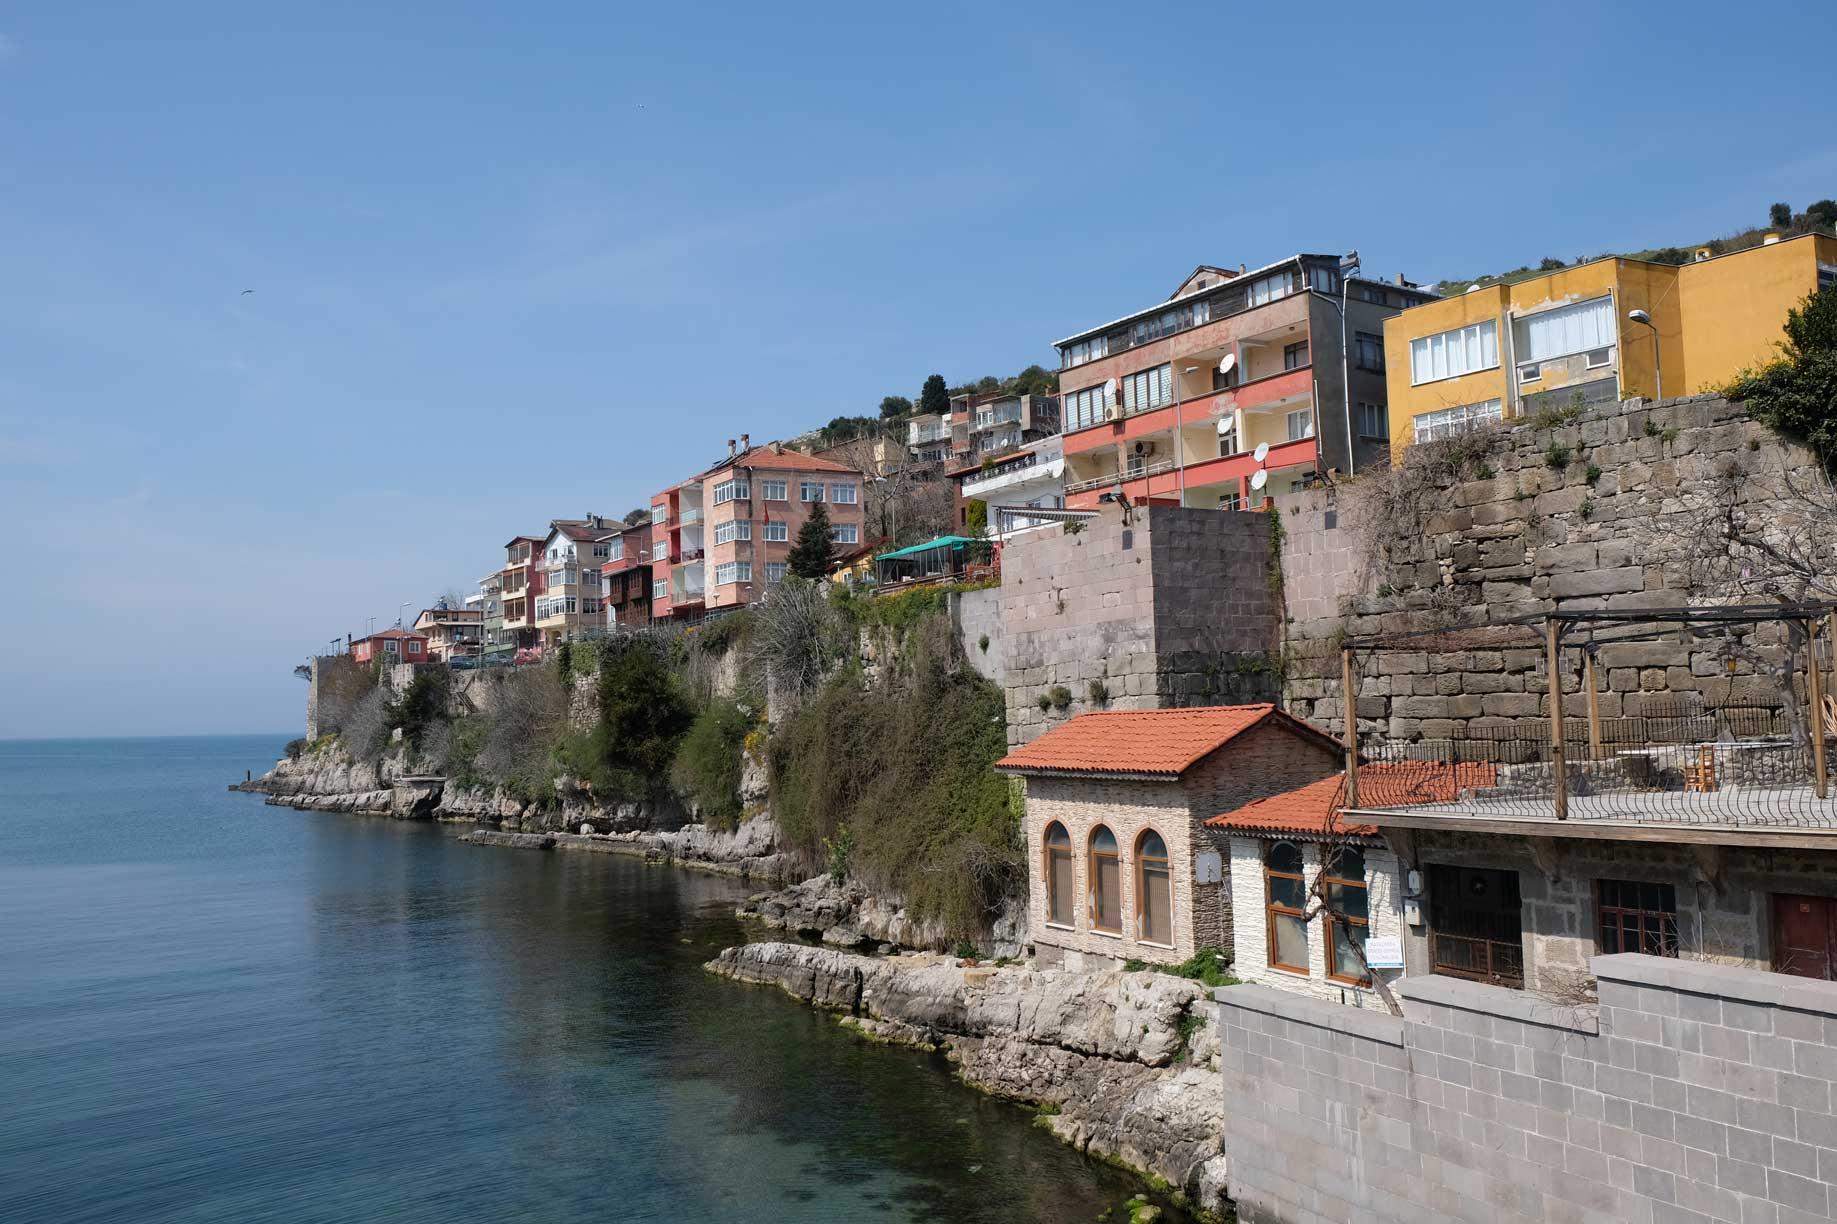 Wohnhäuser am Ufer